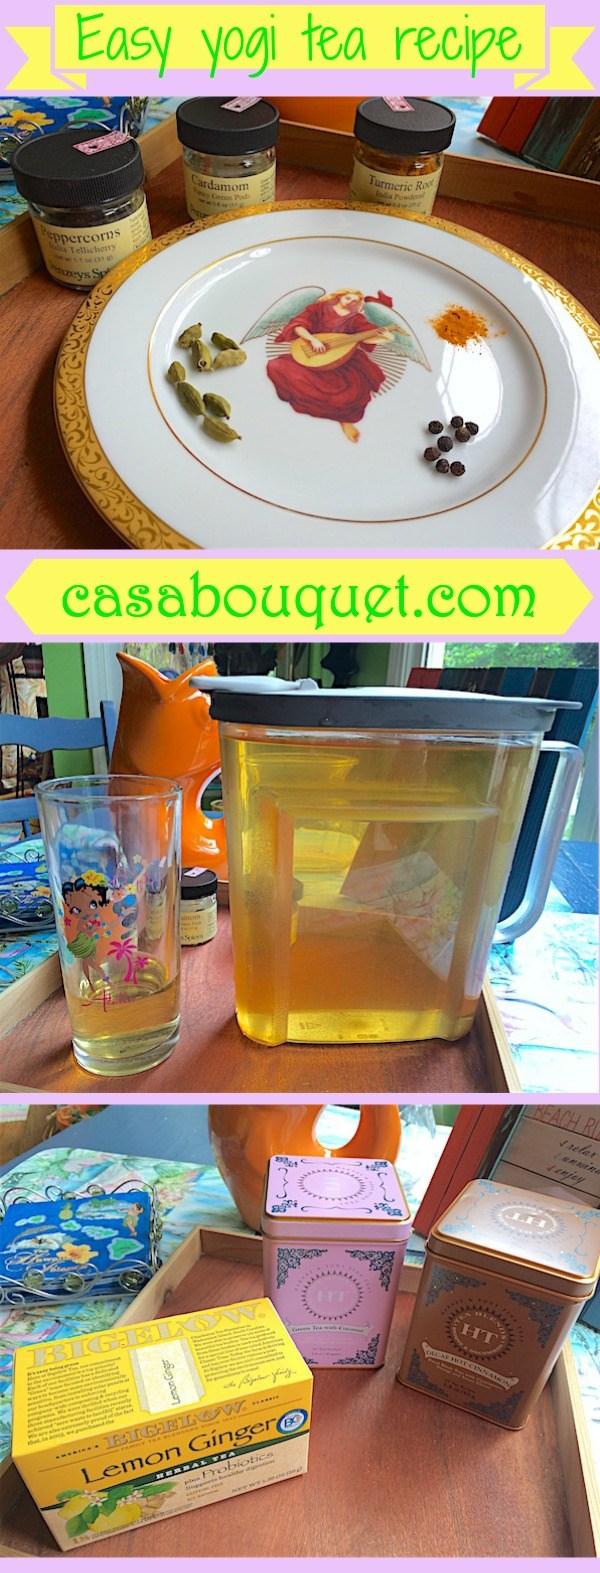 easy yogi tea recipe